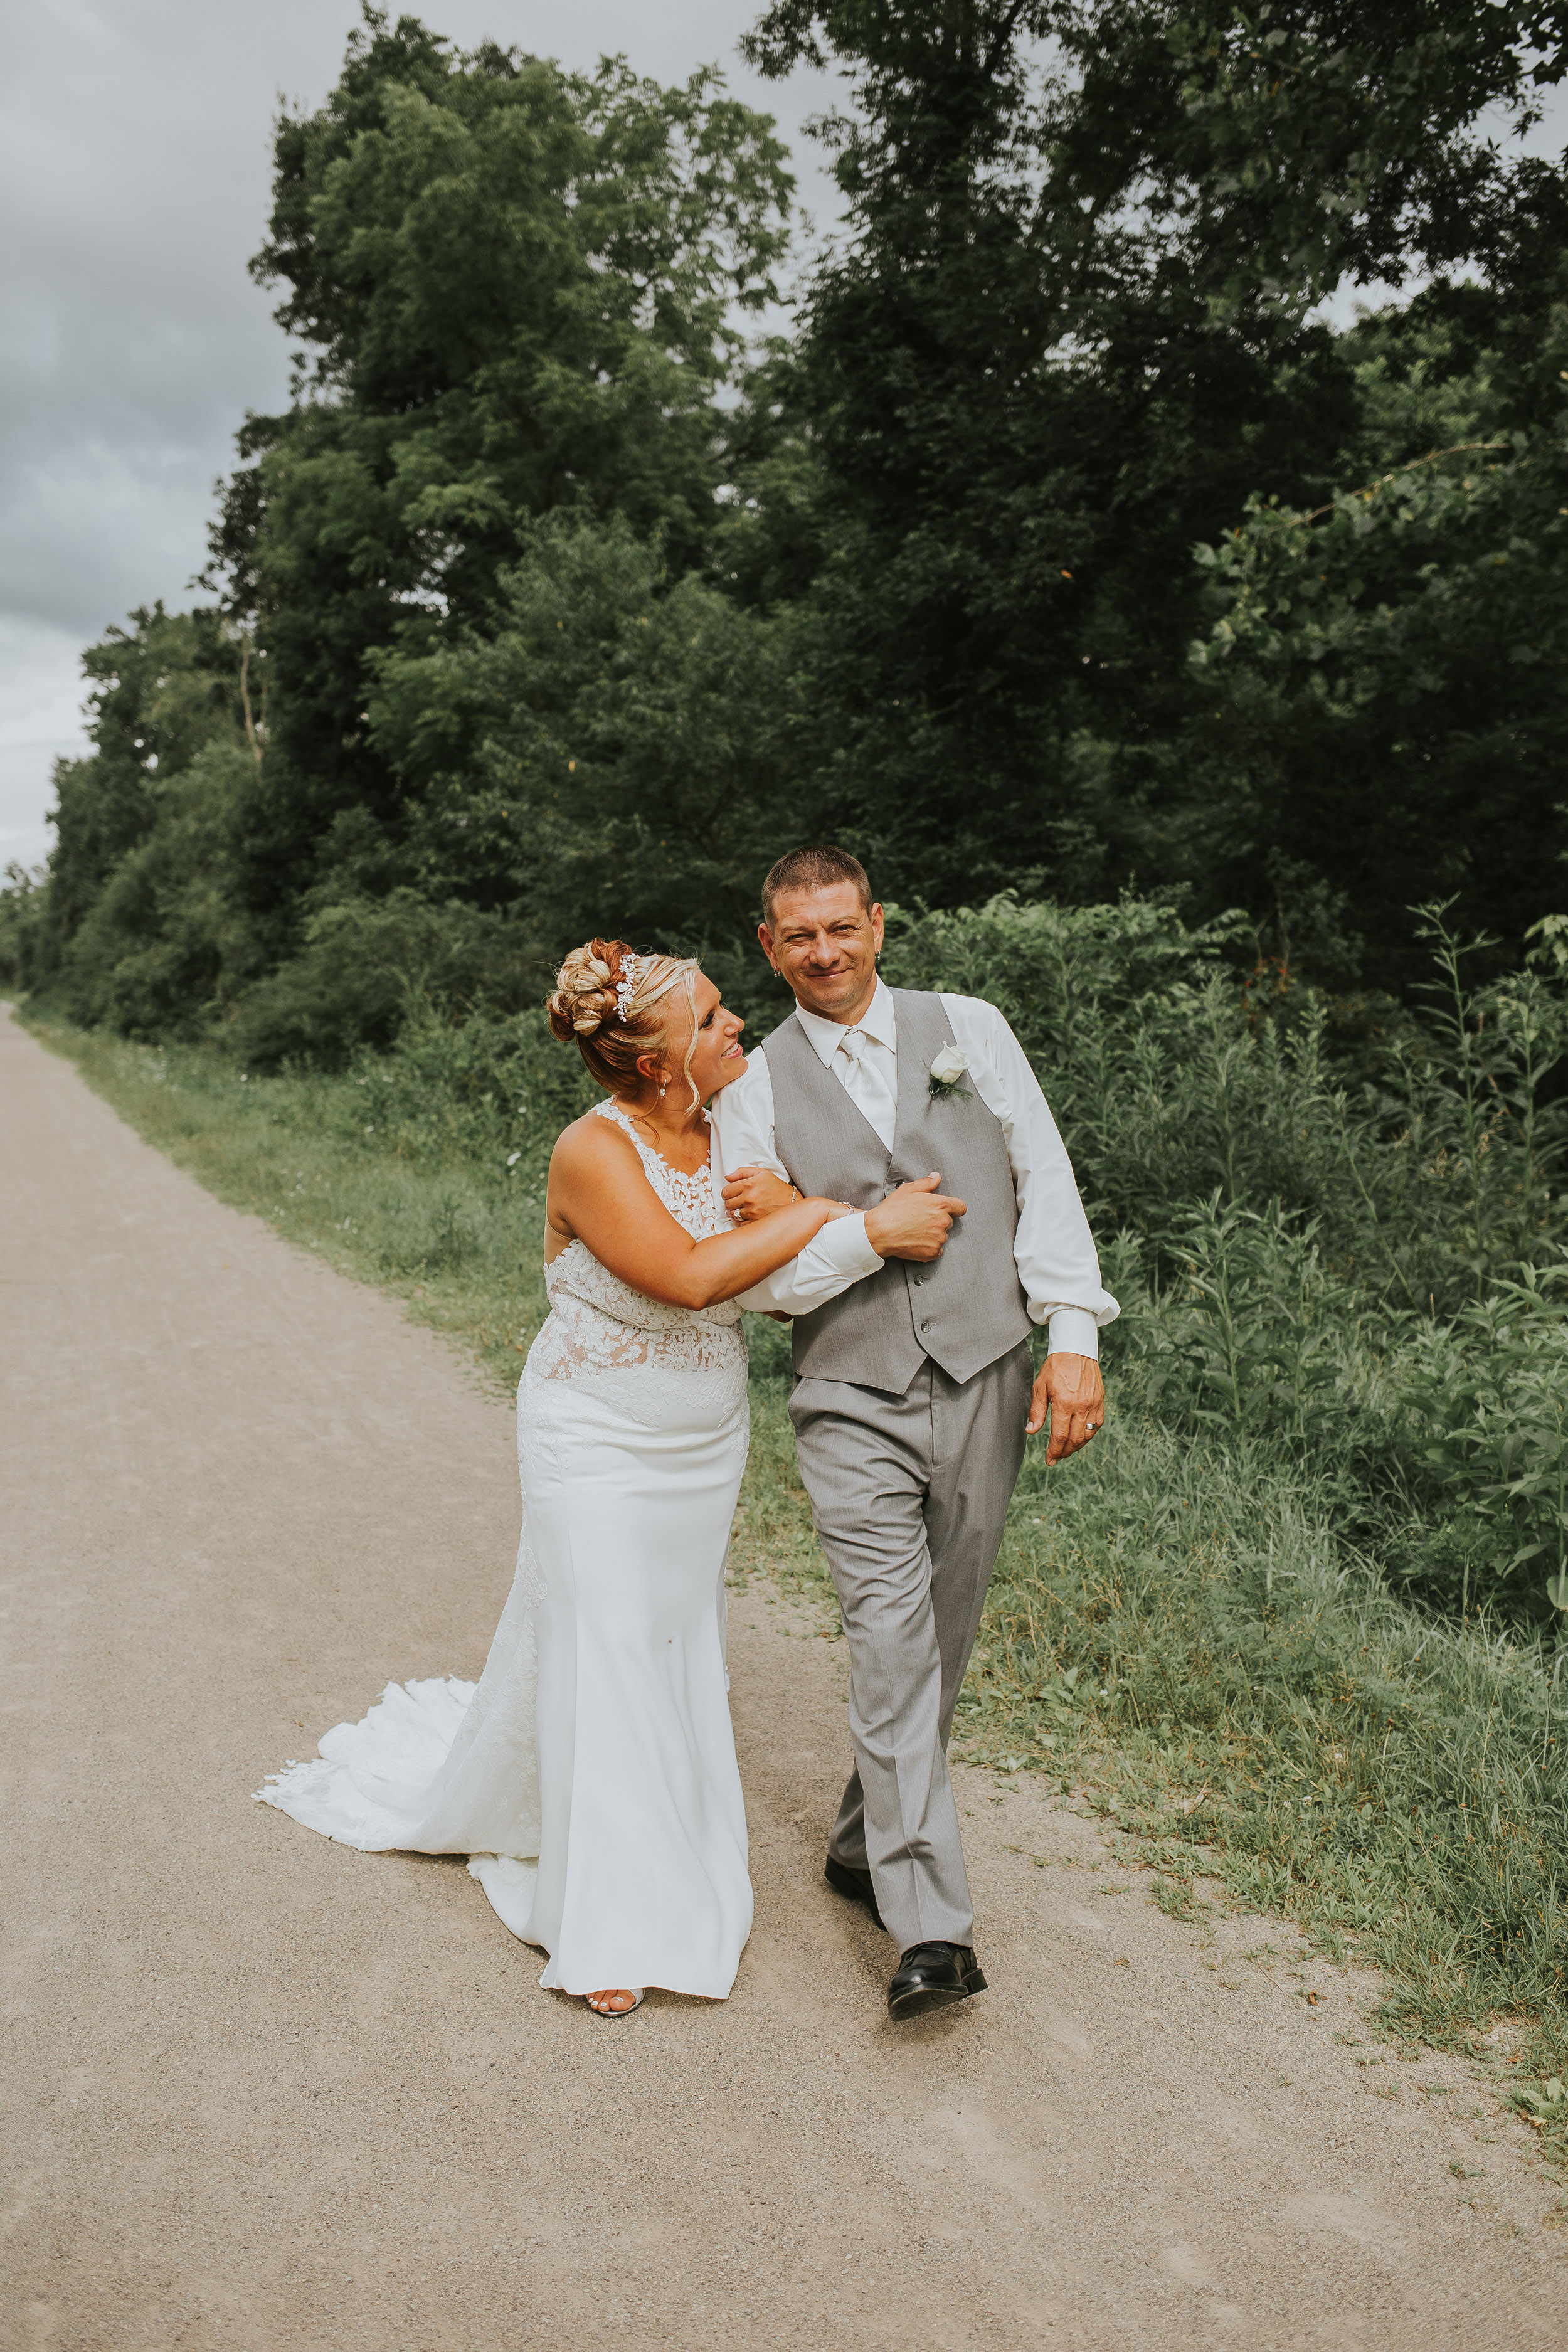 Ligonier western Pennsylvania rustic glamour outdoor summer wedding portrait